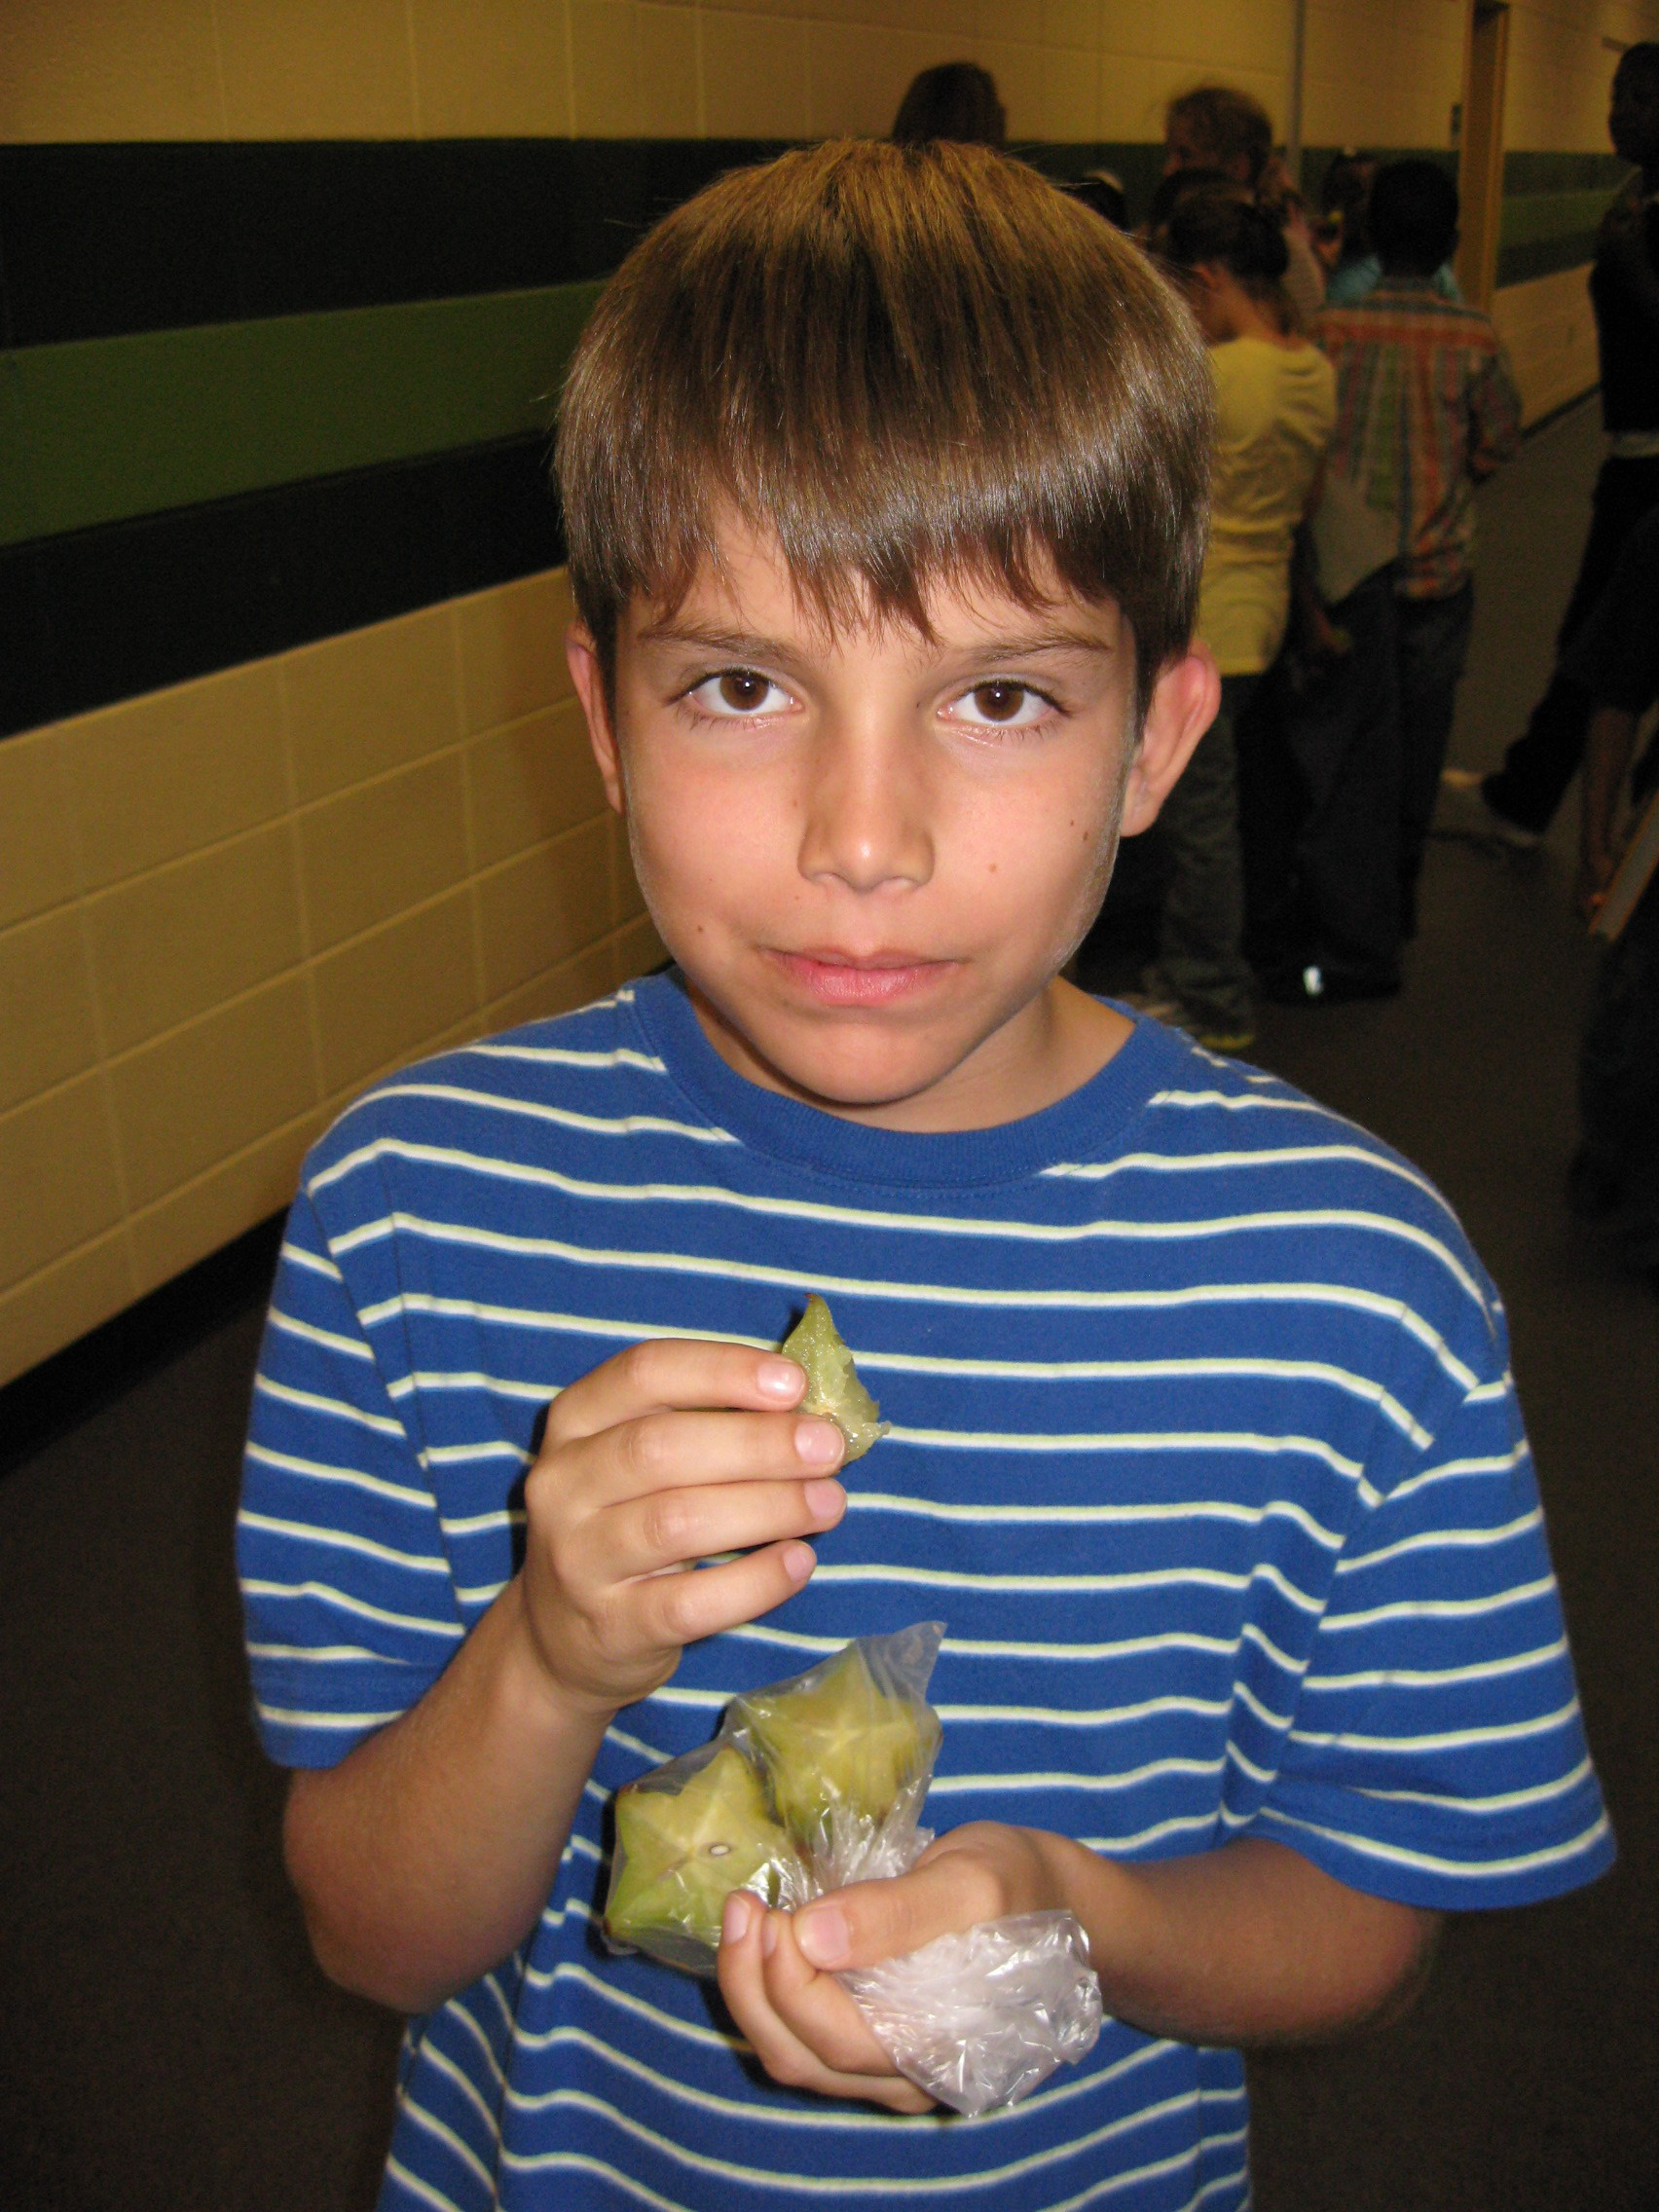 Student holding fruit